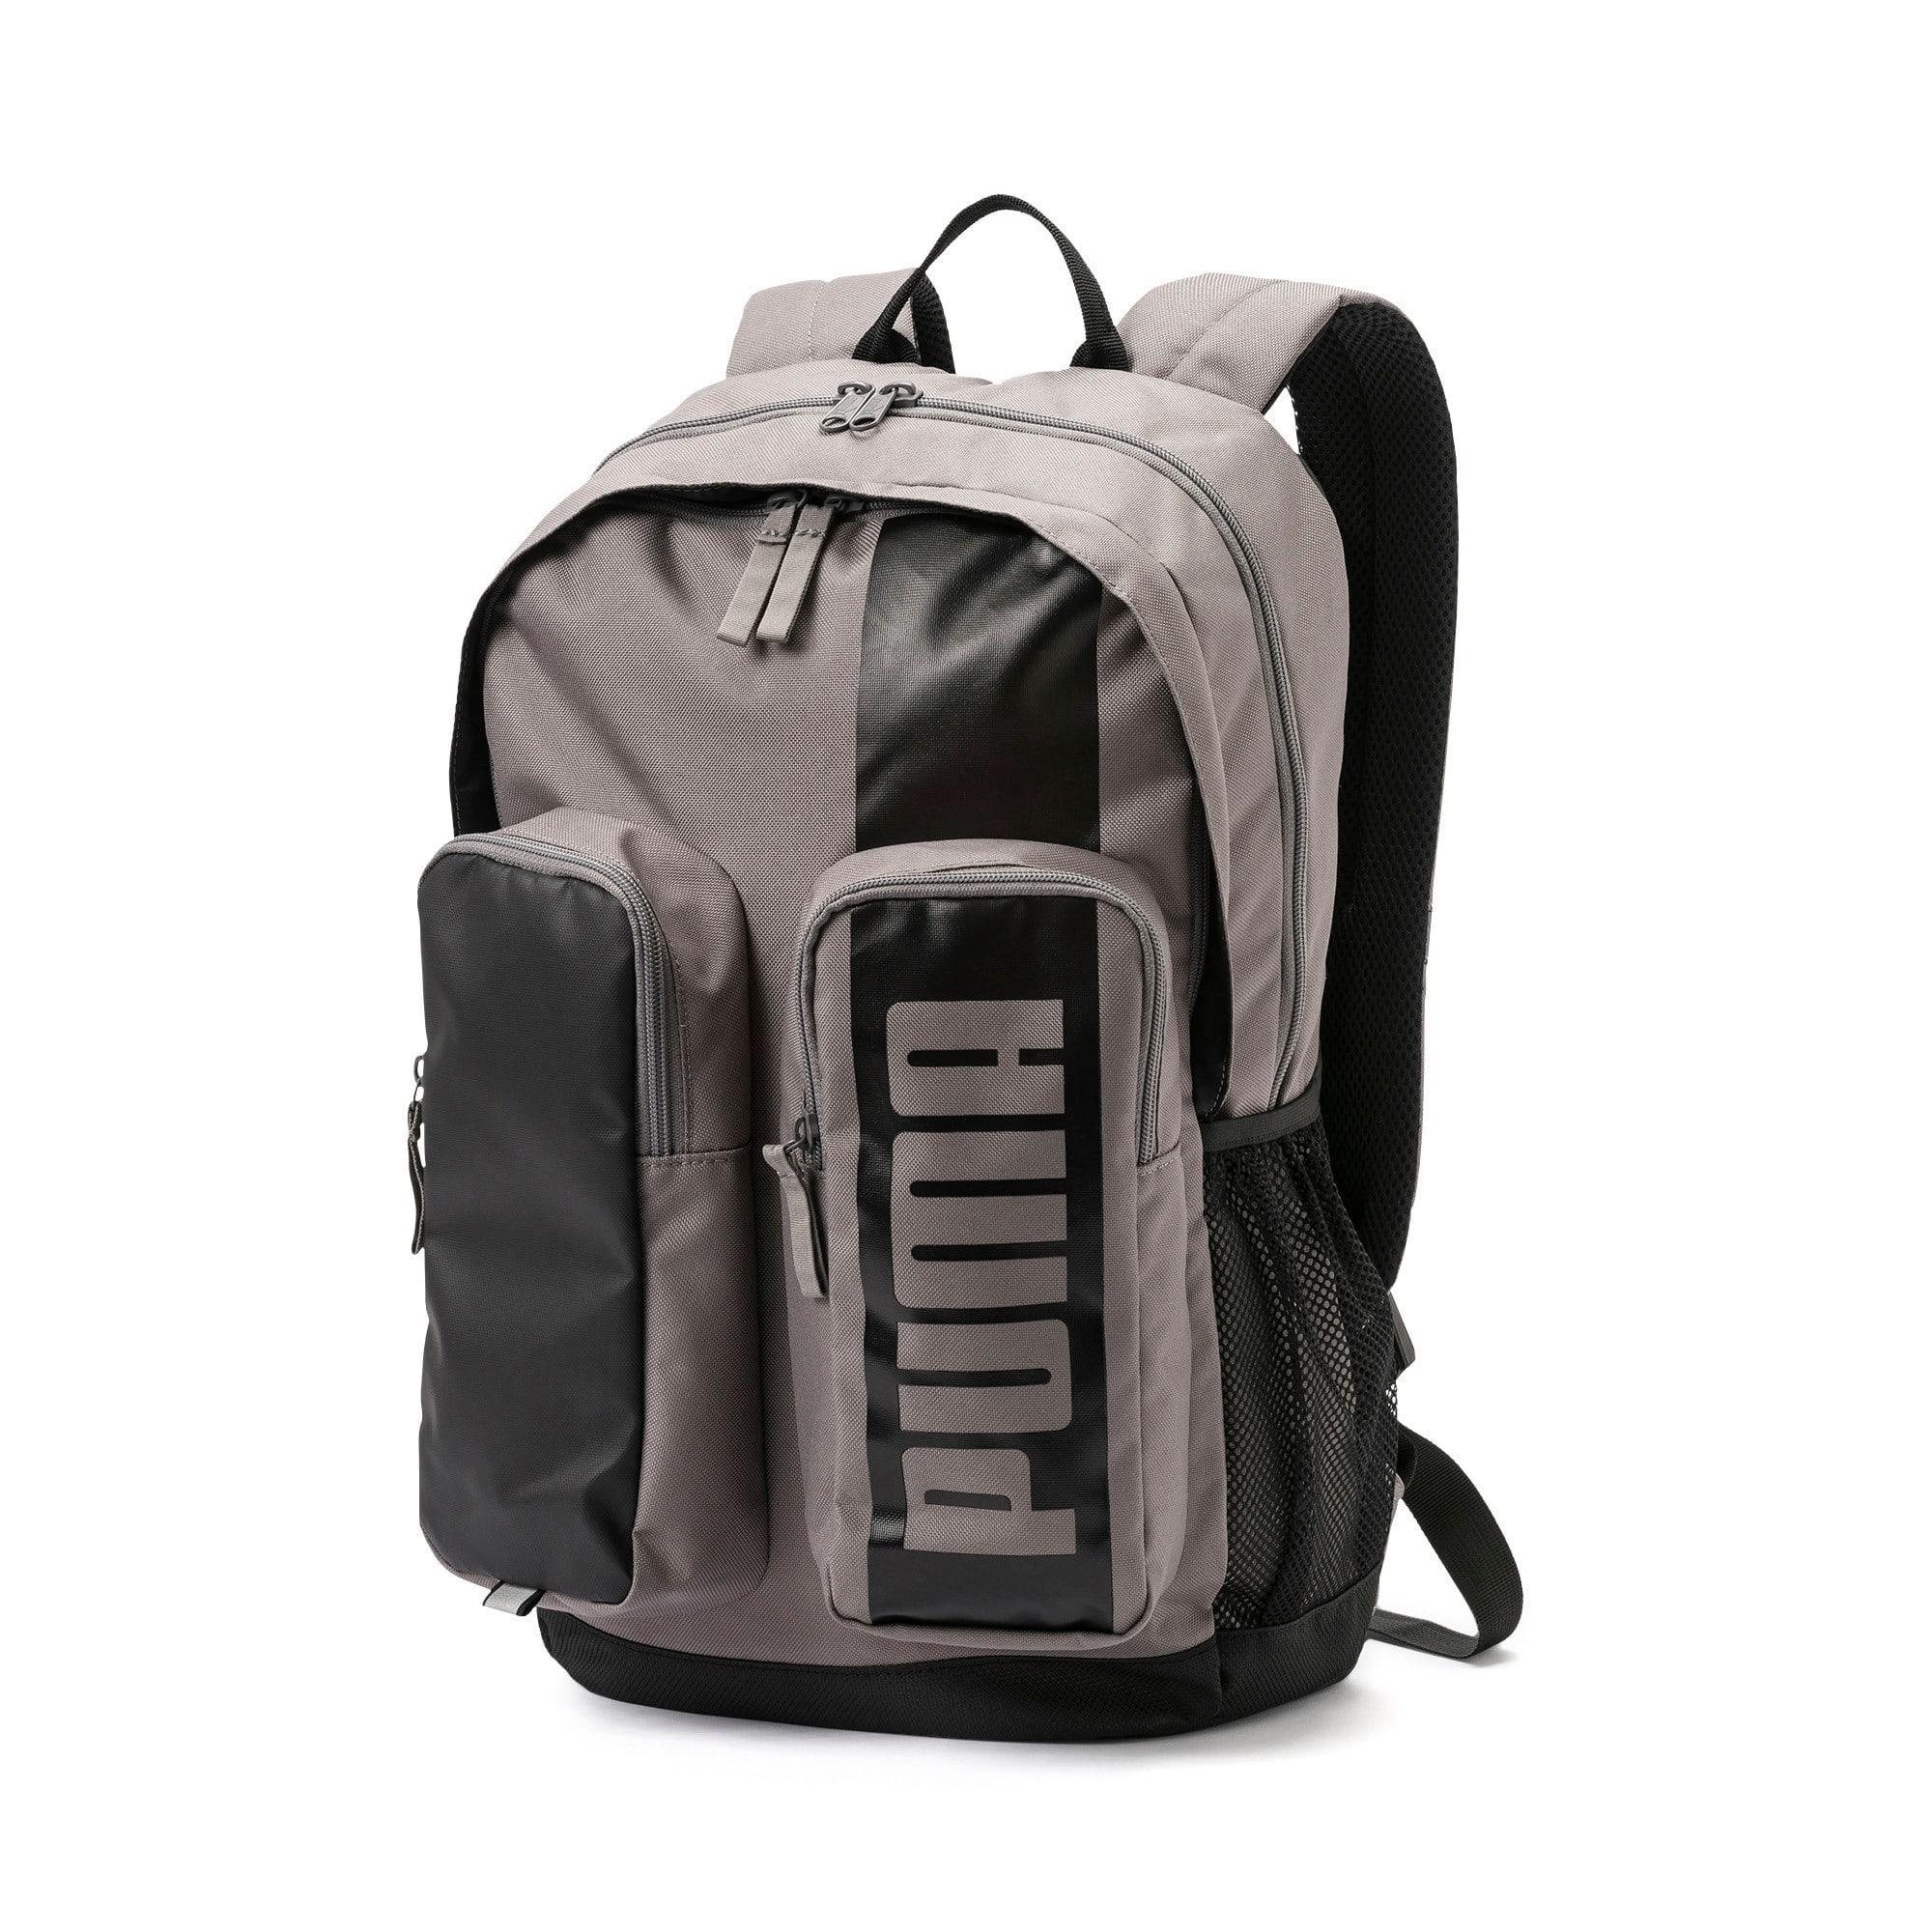 Thumbnail 1 of PUMA Deck Backpack II, Charcoal Gray, medium